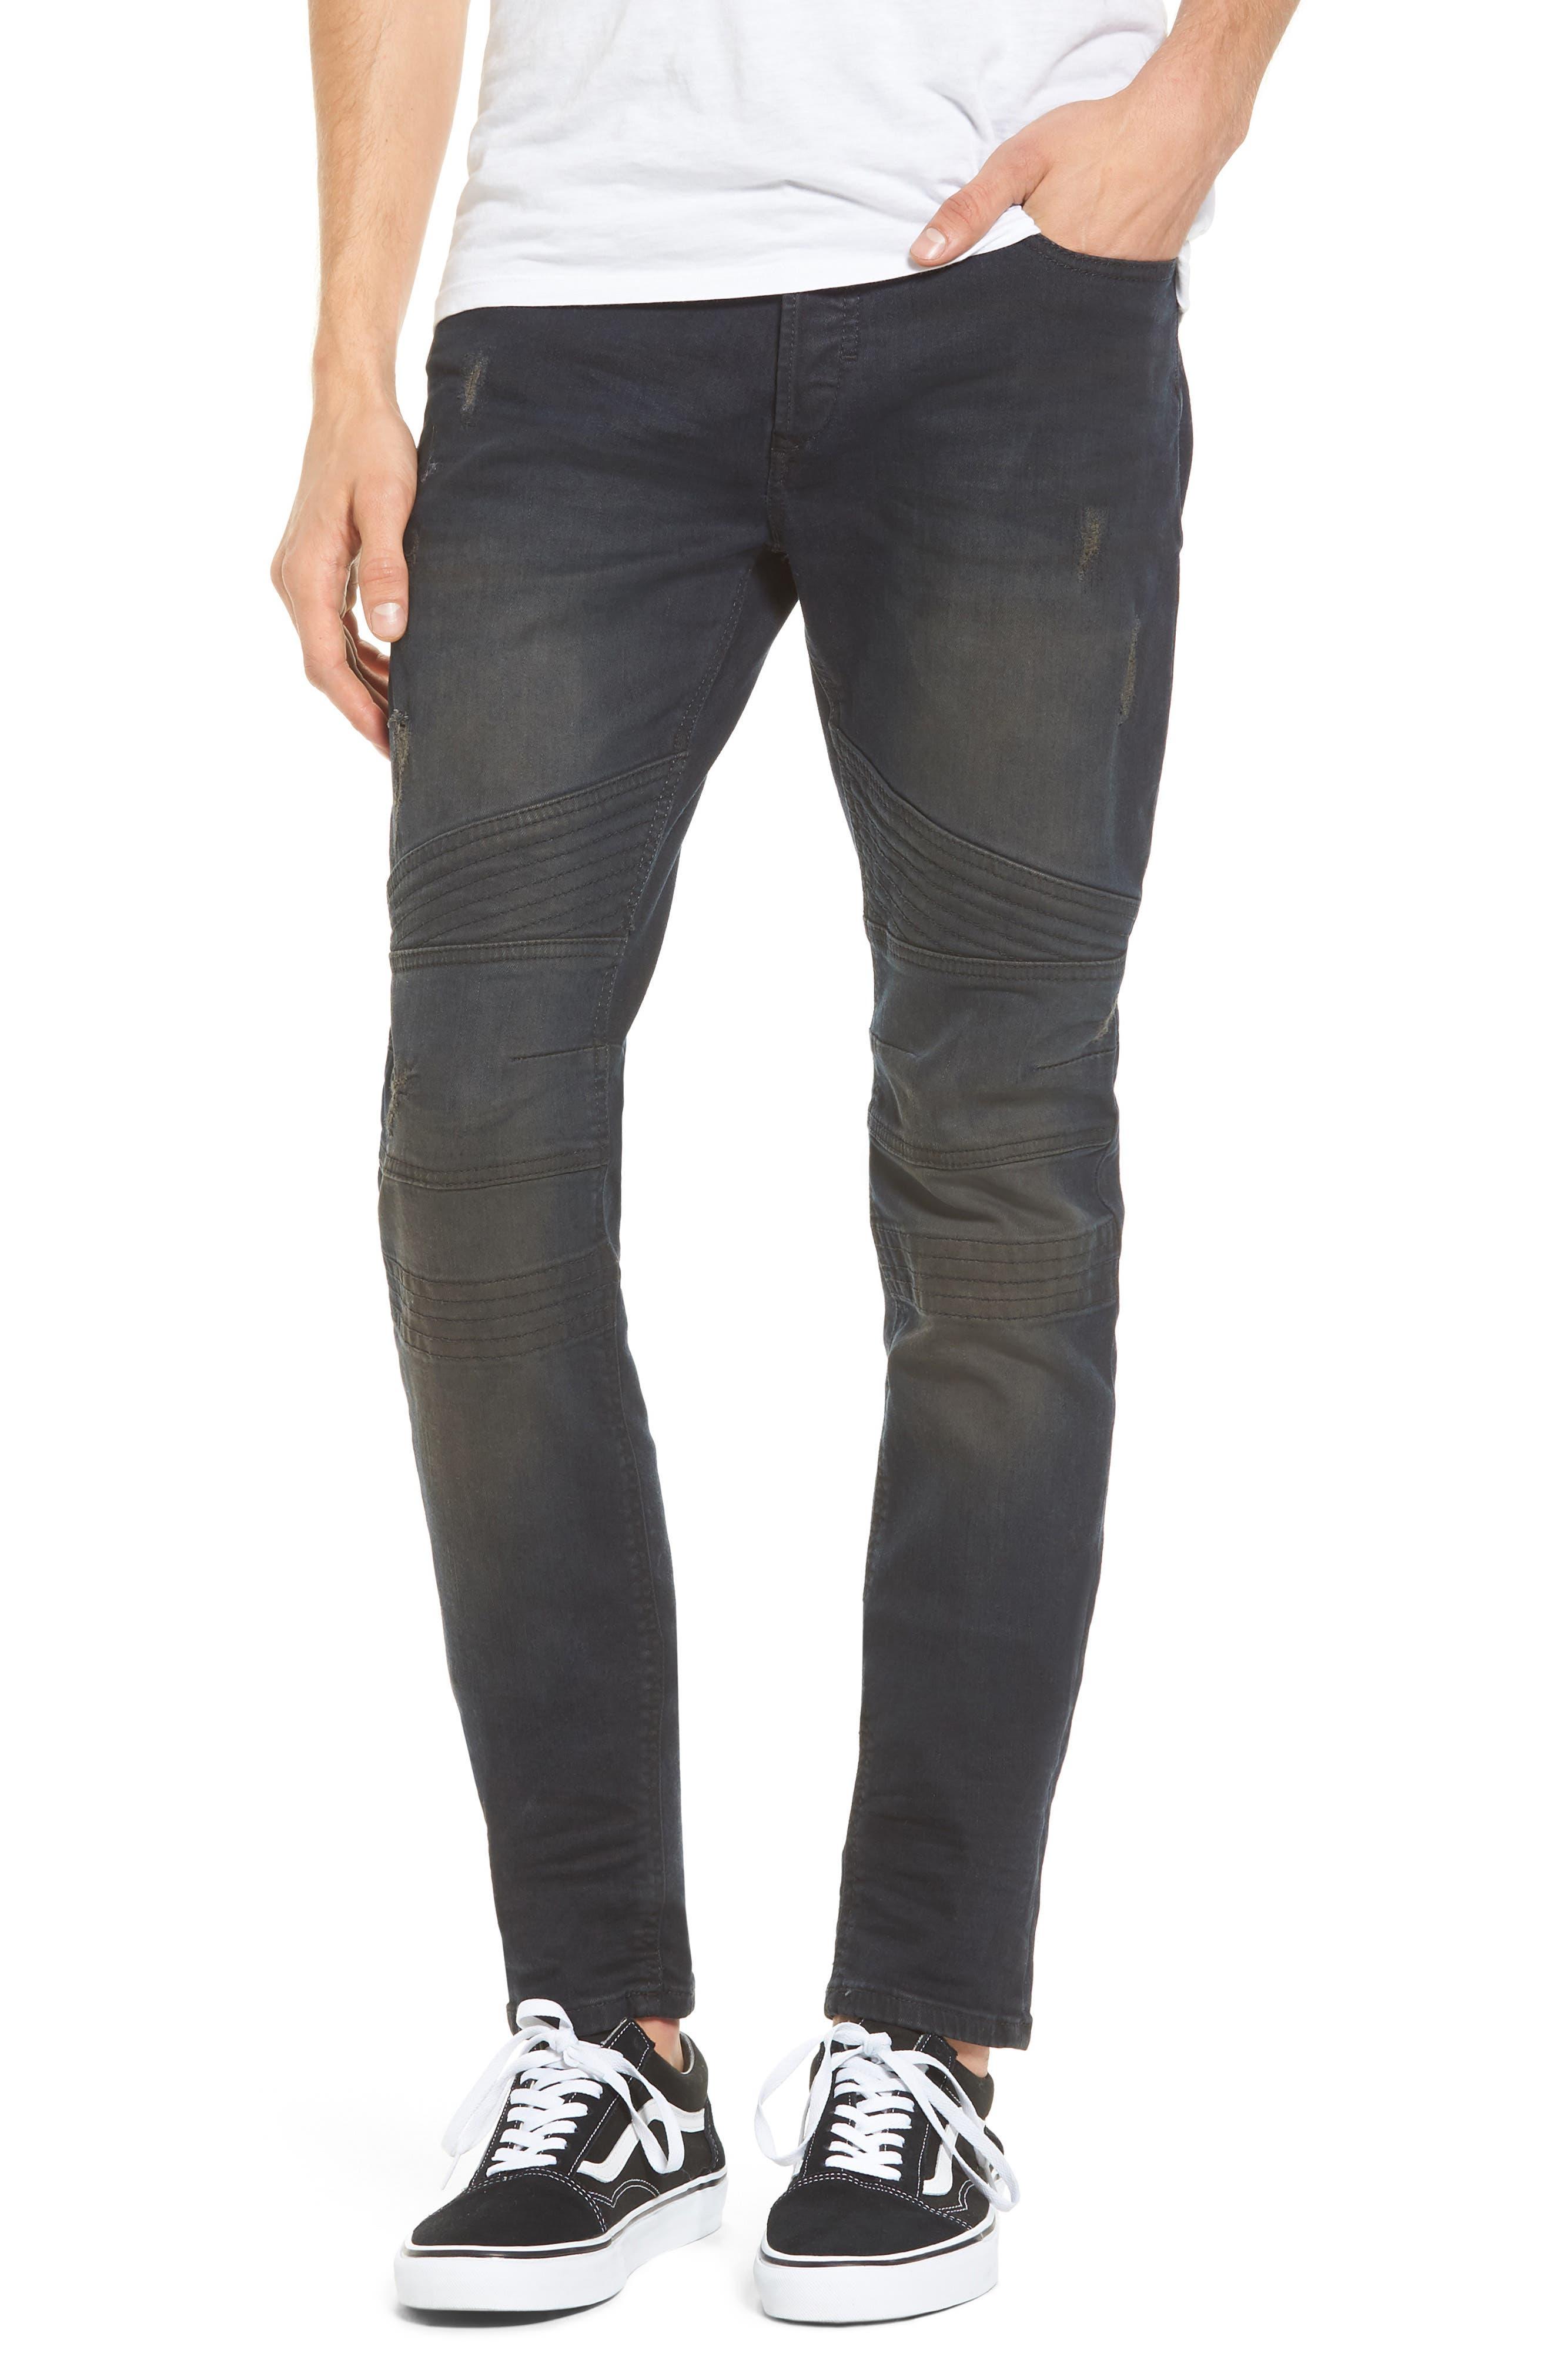 Fourk Skinny Fit Jeans,                             Main thumbnail 1, color,                             Denim